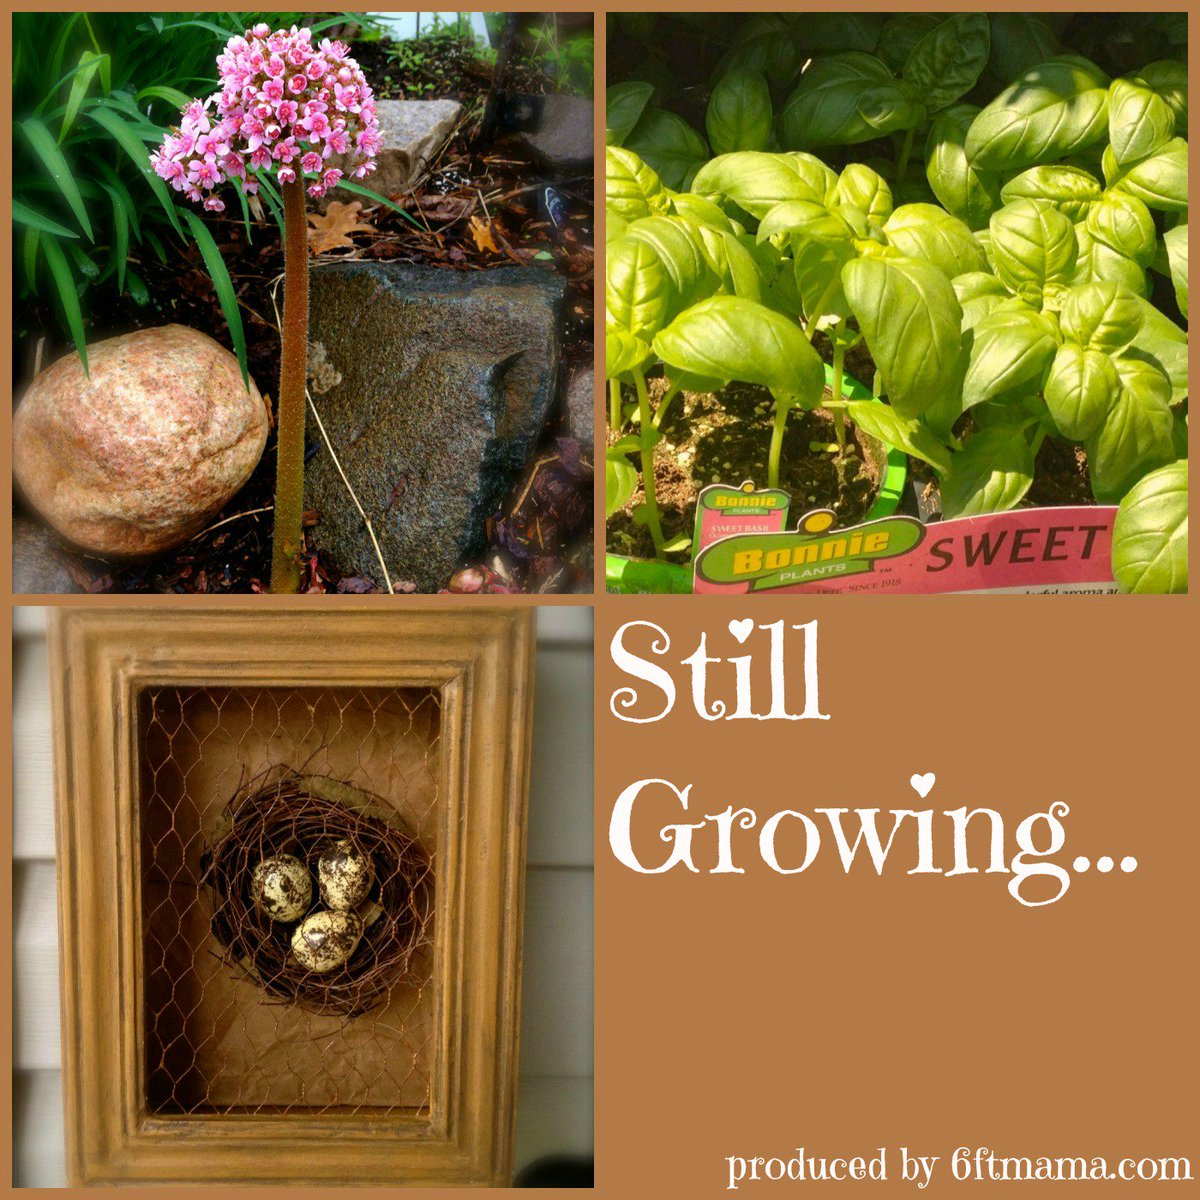 test Twitter Media - Master Gardeners Roundtable - Tips and Tales on the Still Growing Gardening Podcast - https://t.co/64QkjBCdc6 https://t.co/TtjK4CC4TT